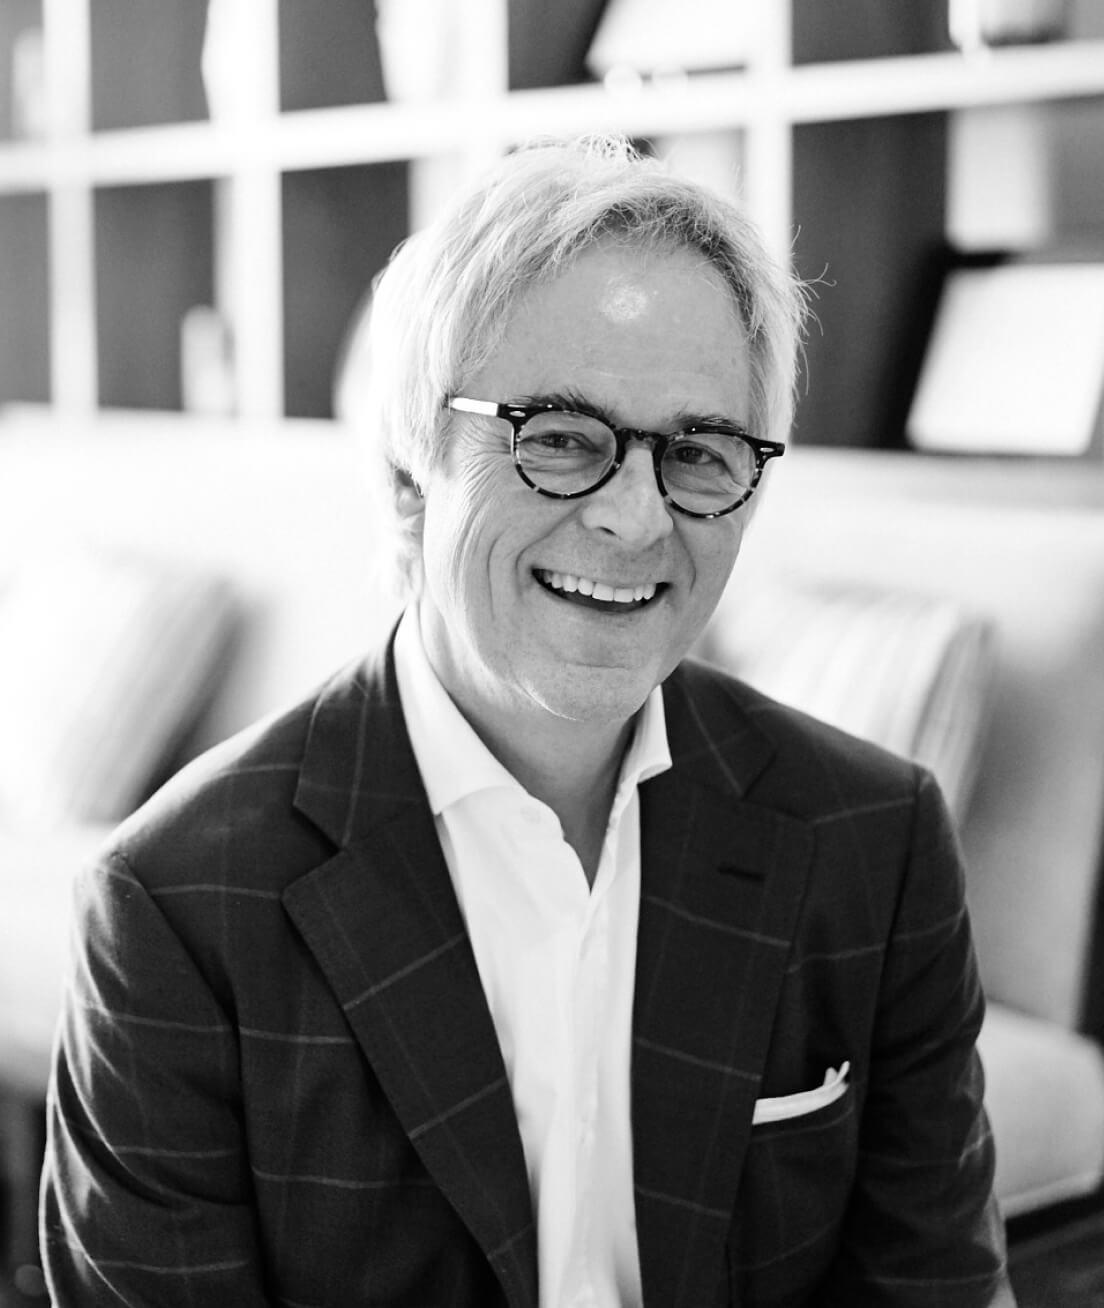 Image of Jim Looney, CEO of Looney & Associates